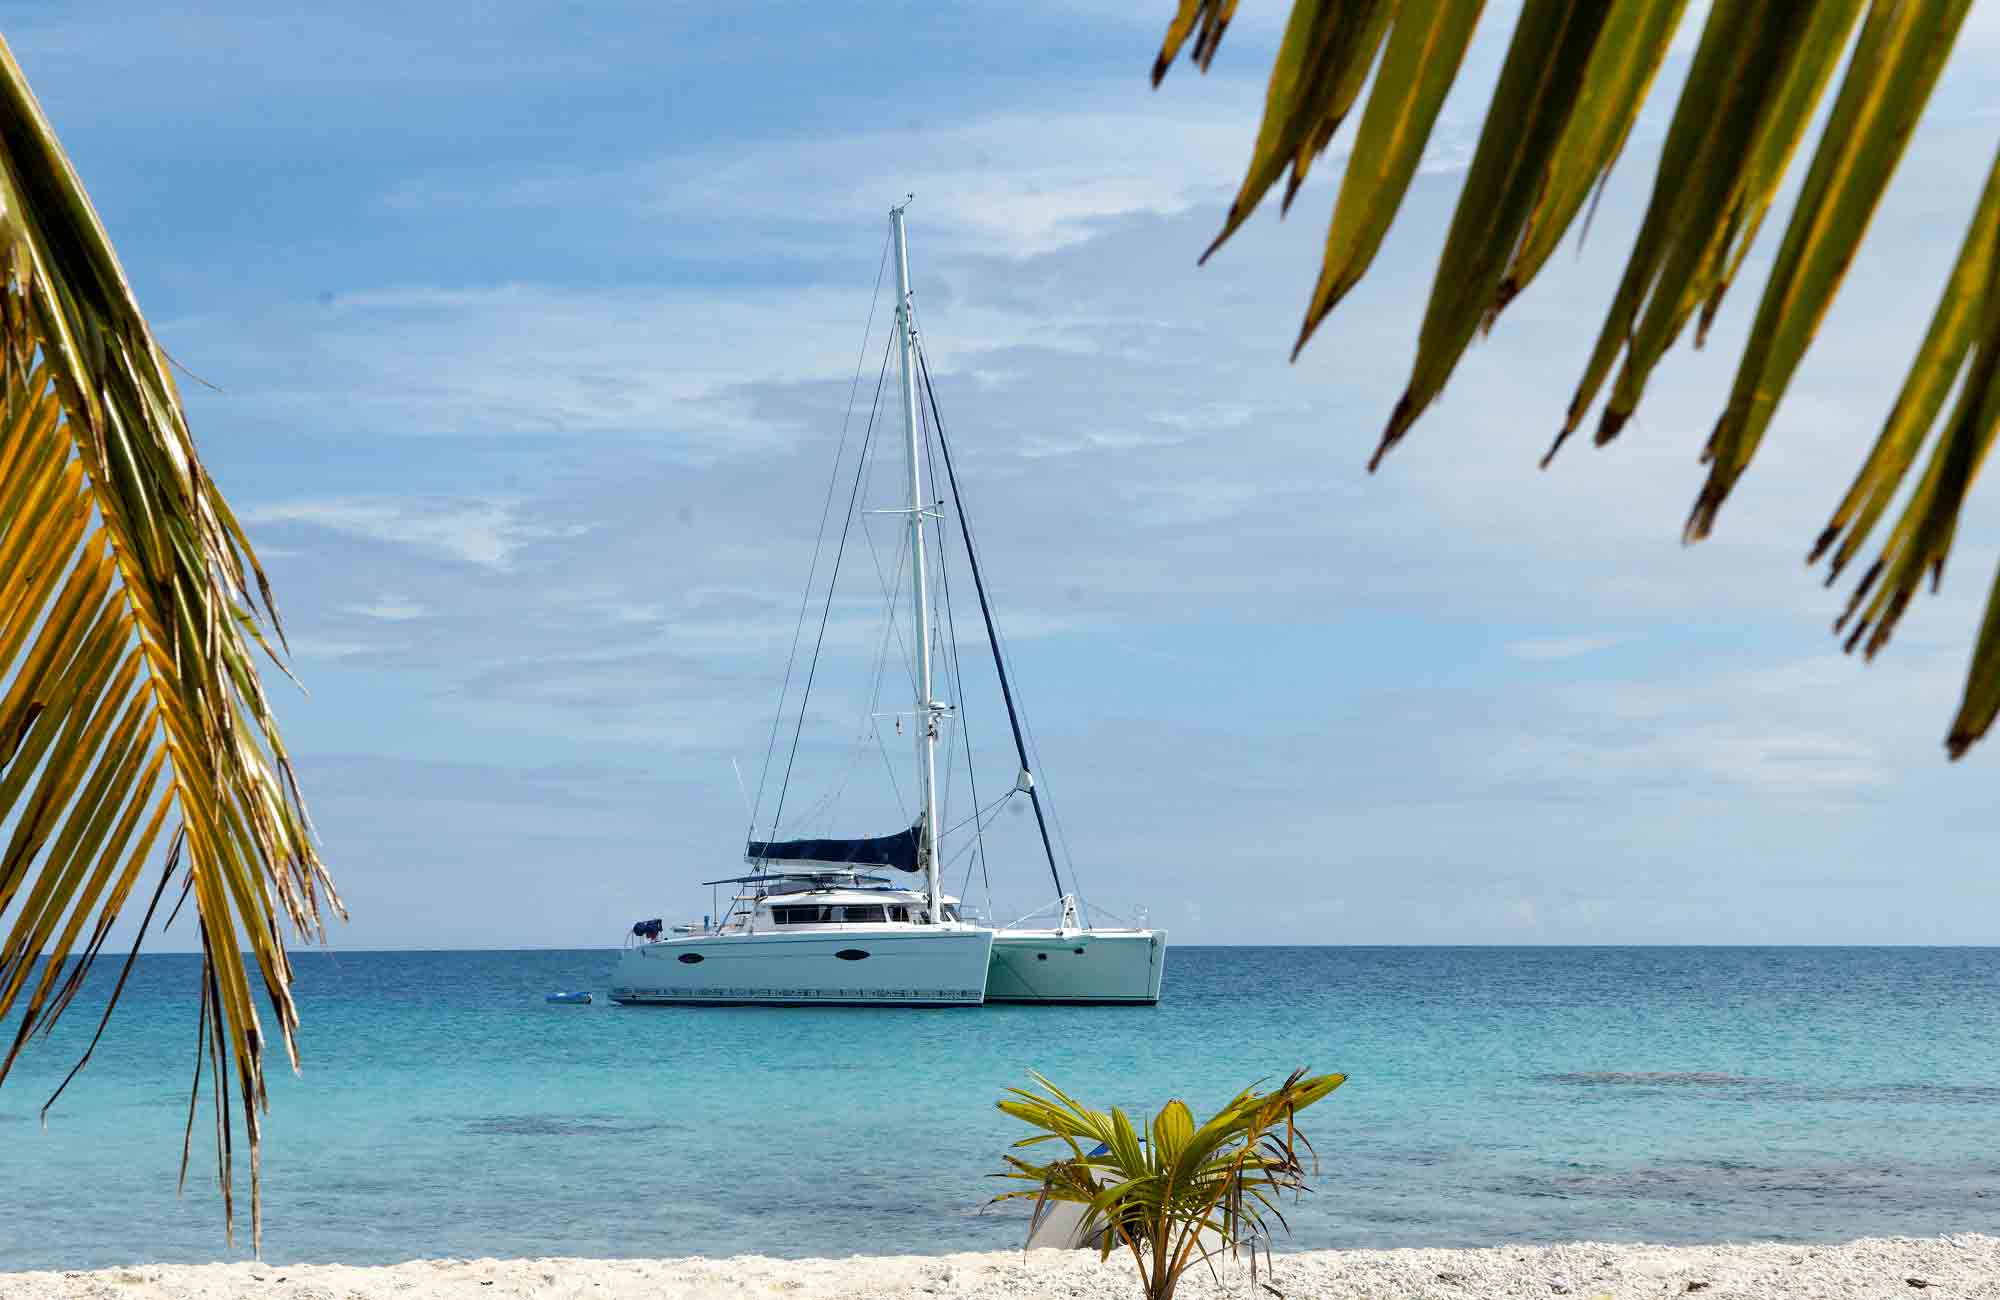 Croisière catamaran eleuthera 60 avec Amplitudes en Indonésie